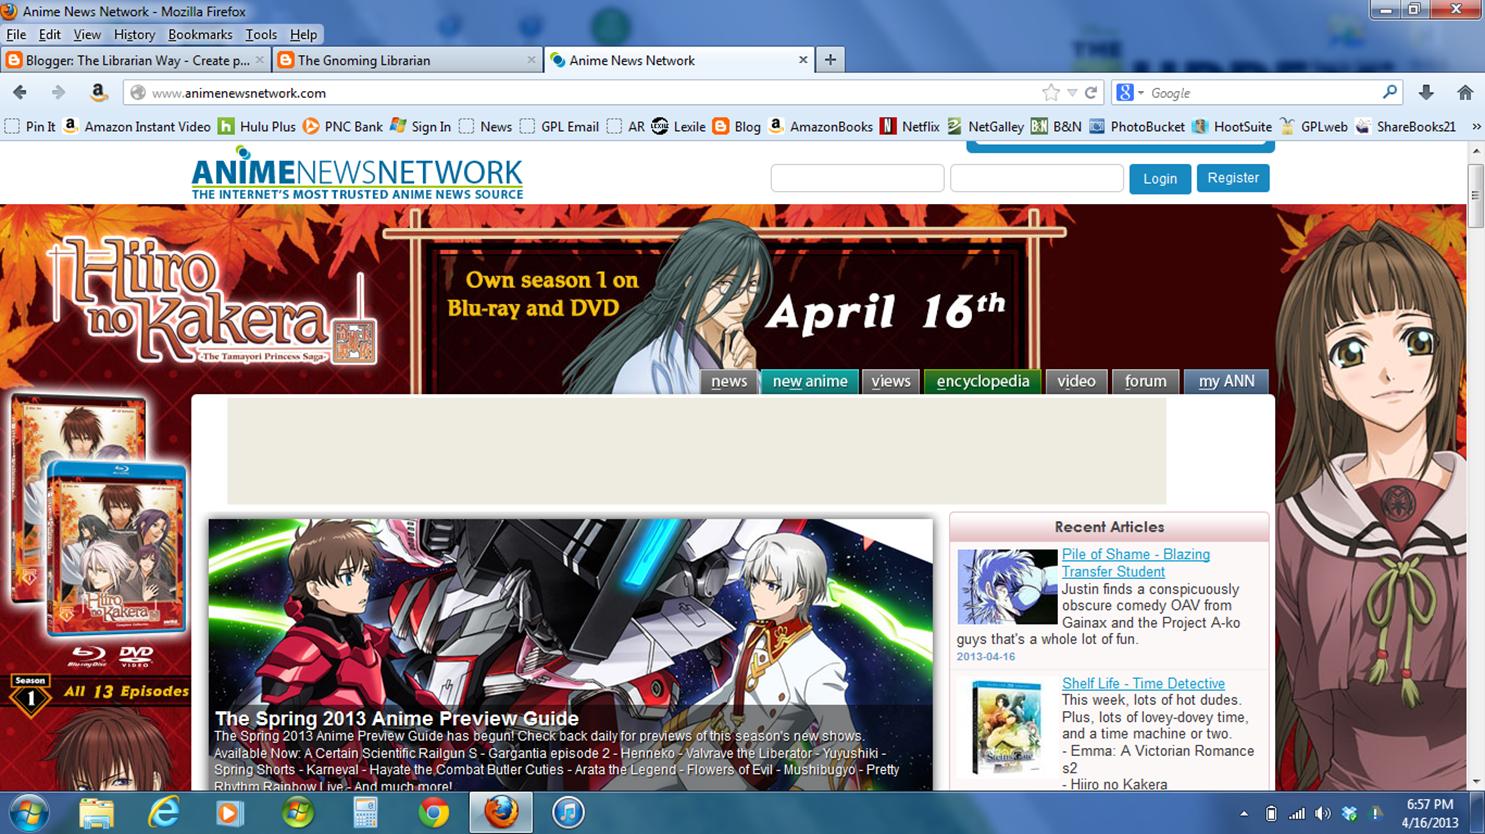 Anime News Network #